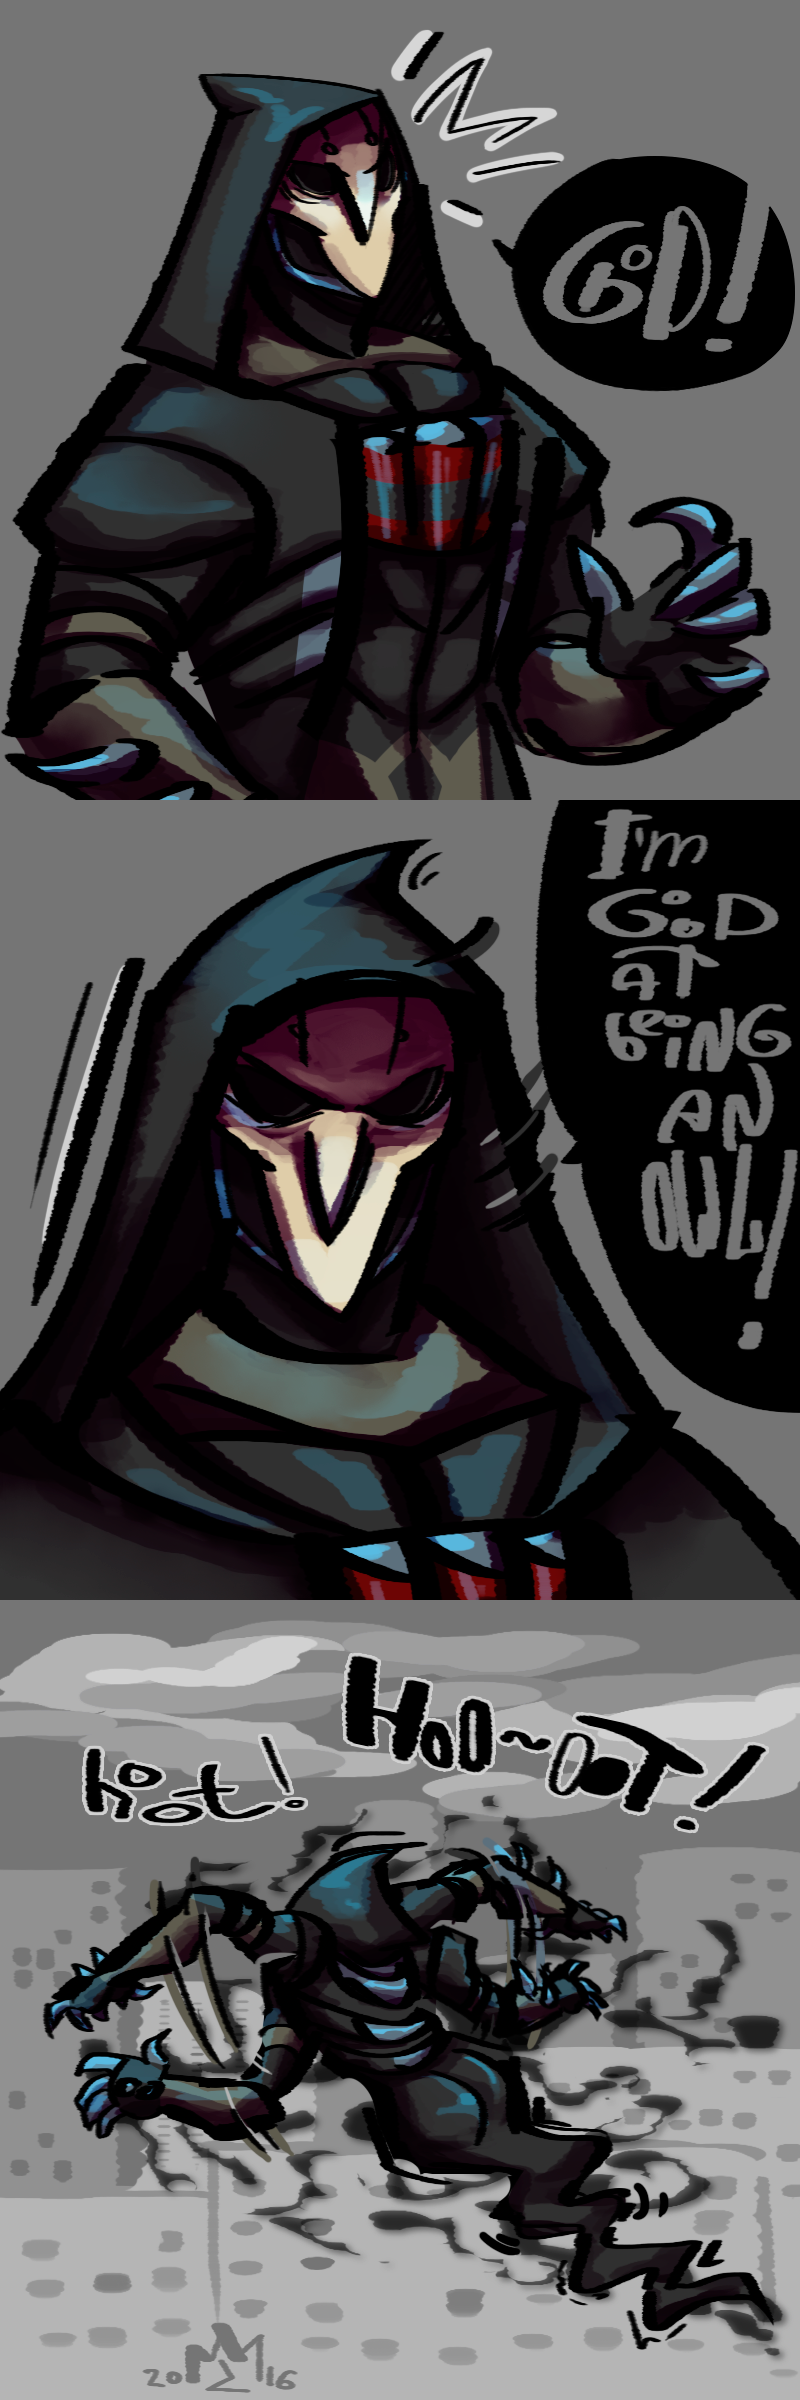 Owl Overwatch